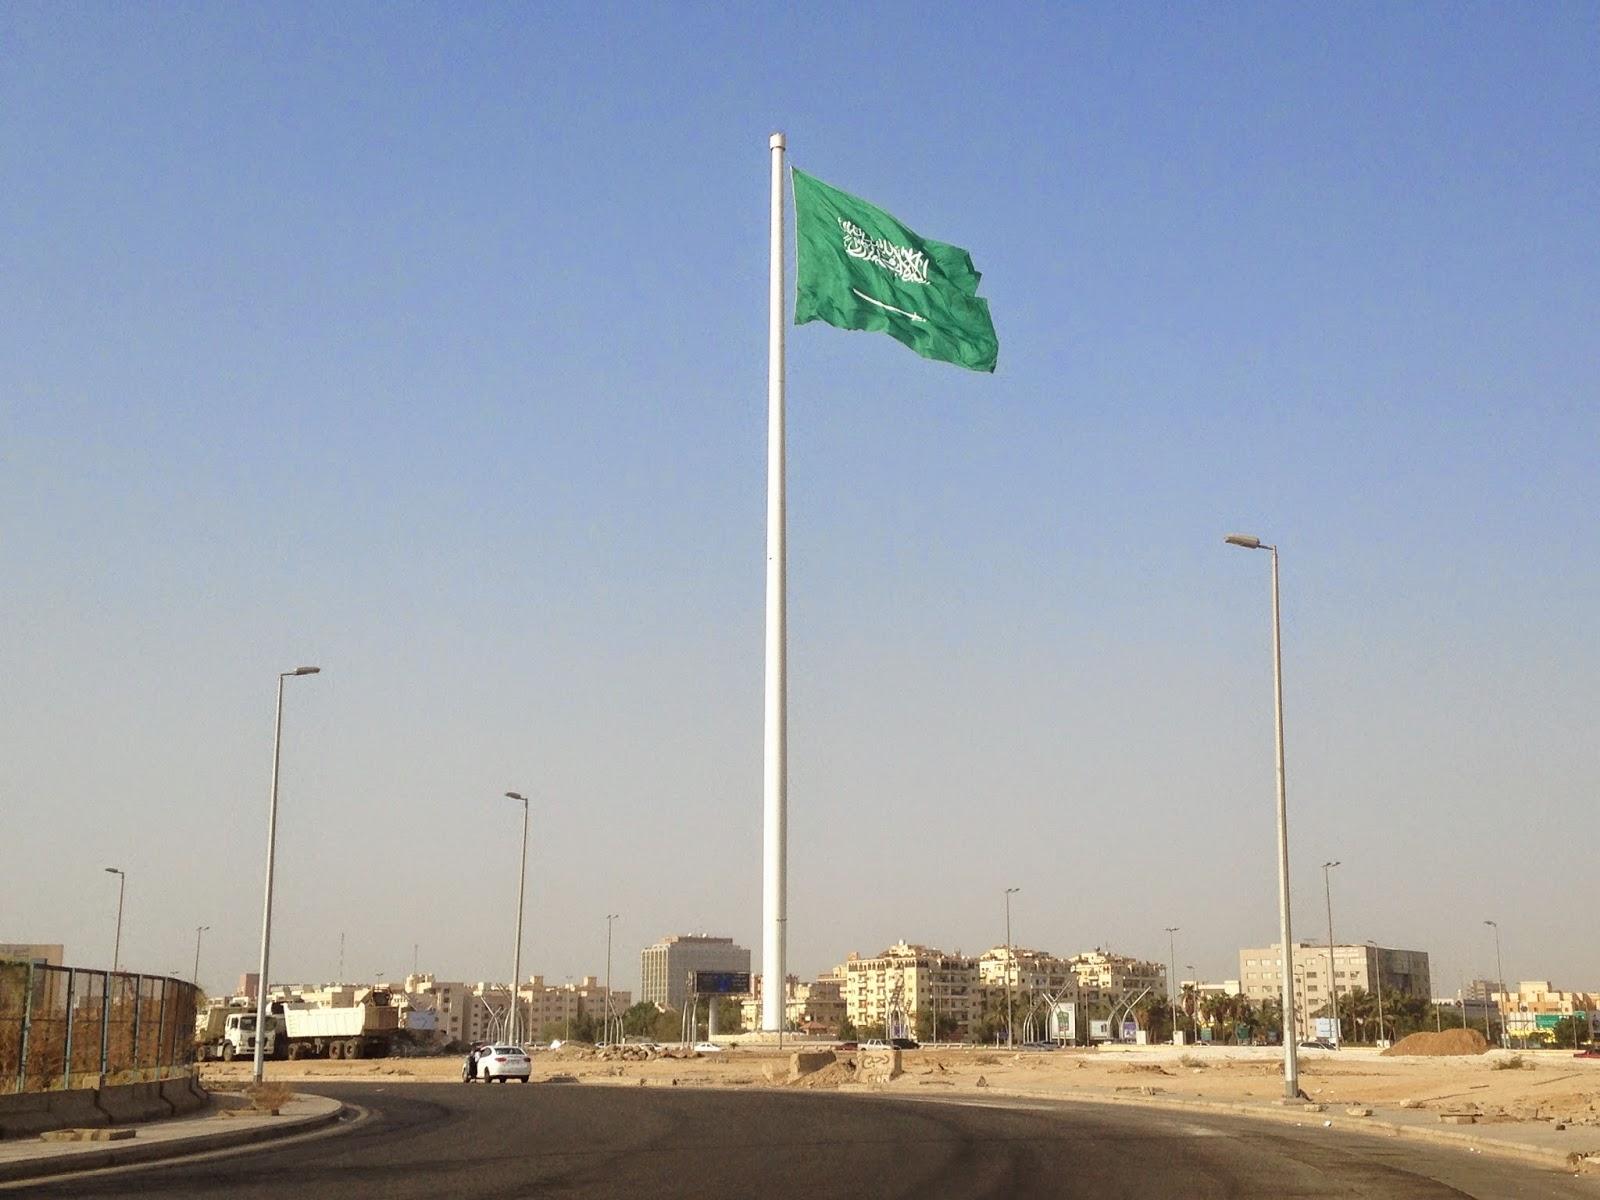 Jeddah Flagpole - Tallest Flagpole in the World - SaudiBuzz